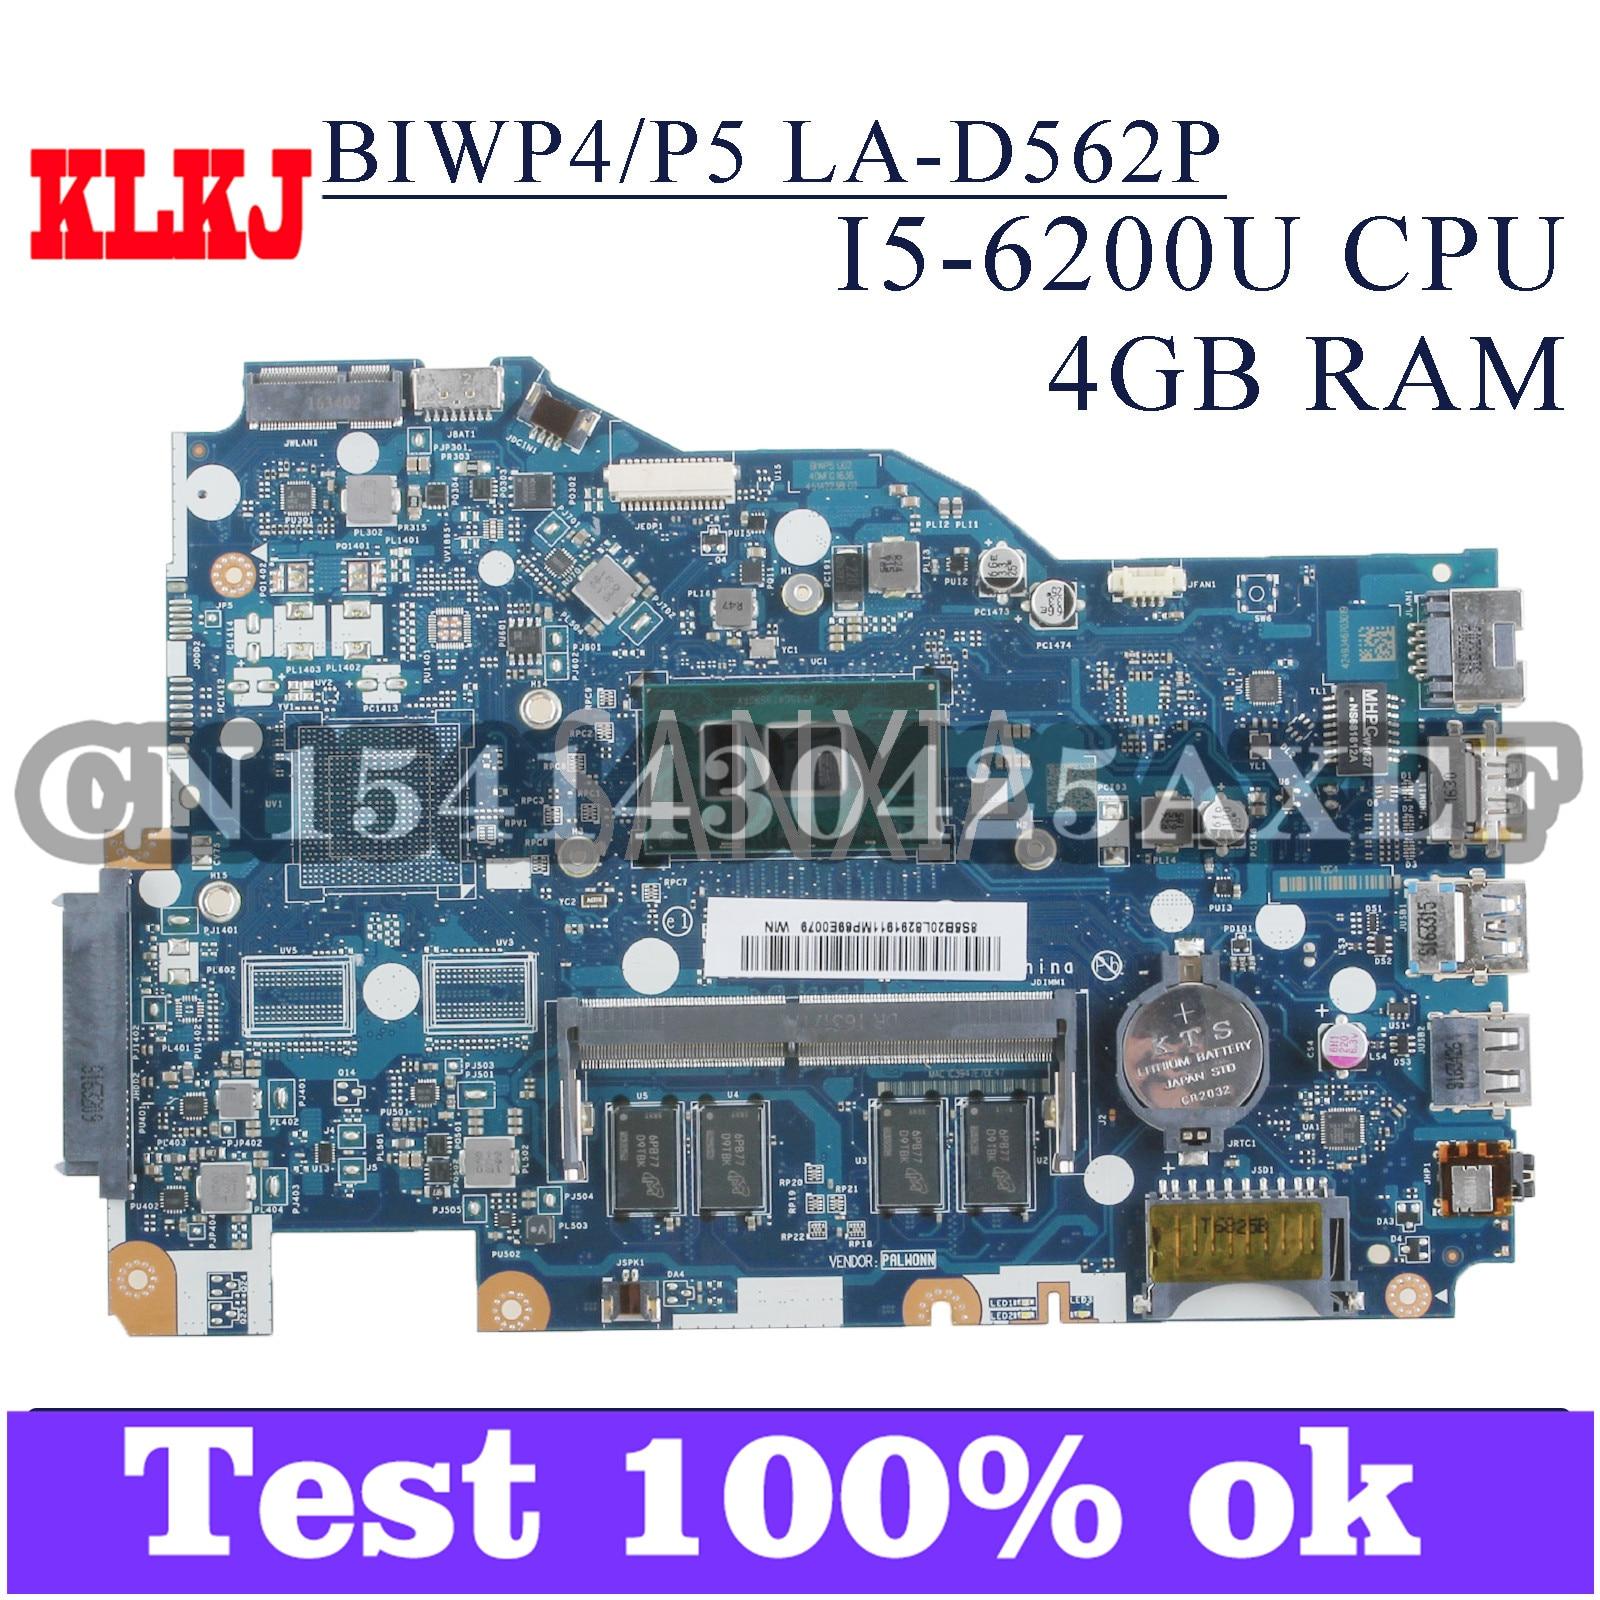 KLKJ LA-D562P اللوحة الرئيسية Laotop لينوفو Ideapad 110-15ISK اللوحة الرئيسية الأصلية 4G-RAM I5-6200U